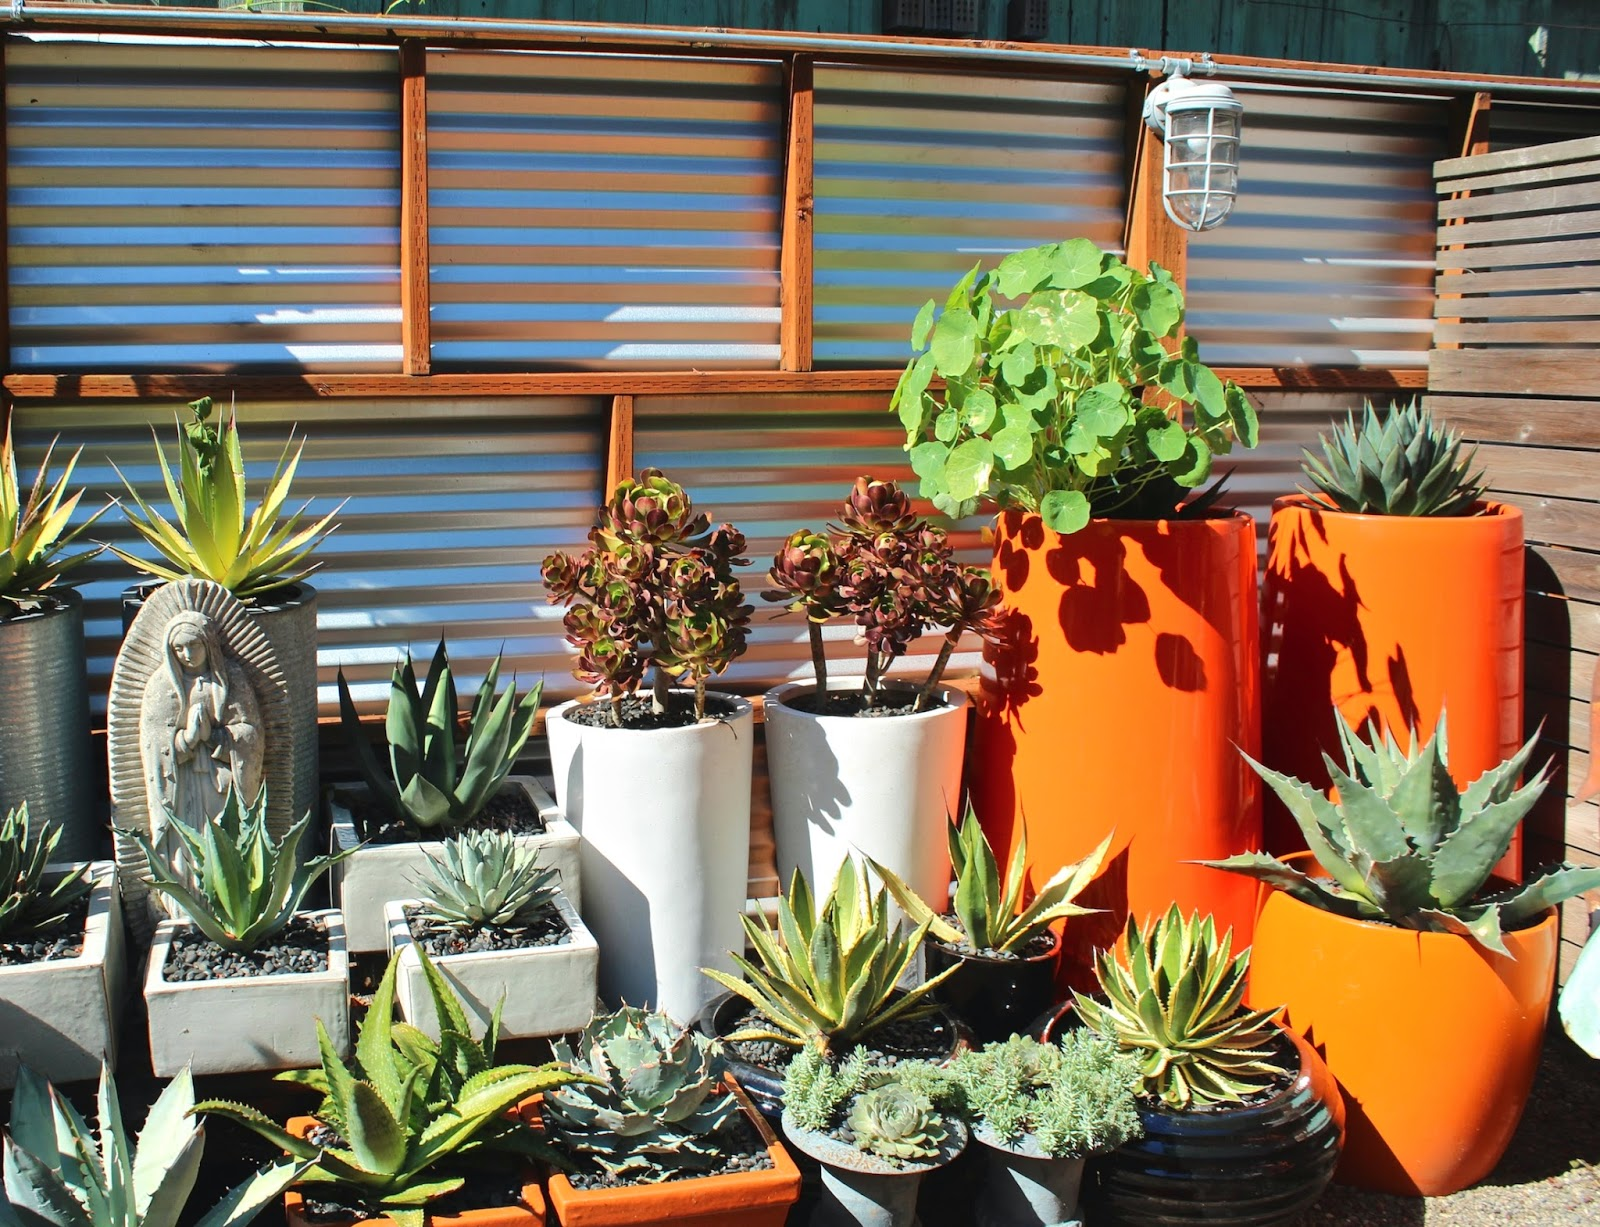 Sharing nature 39 s garden hot art and design spice up for Garden pots portland